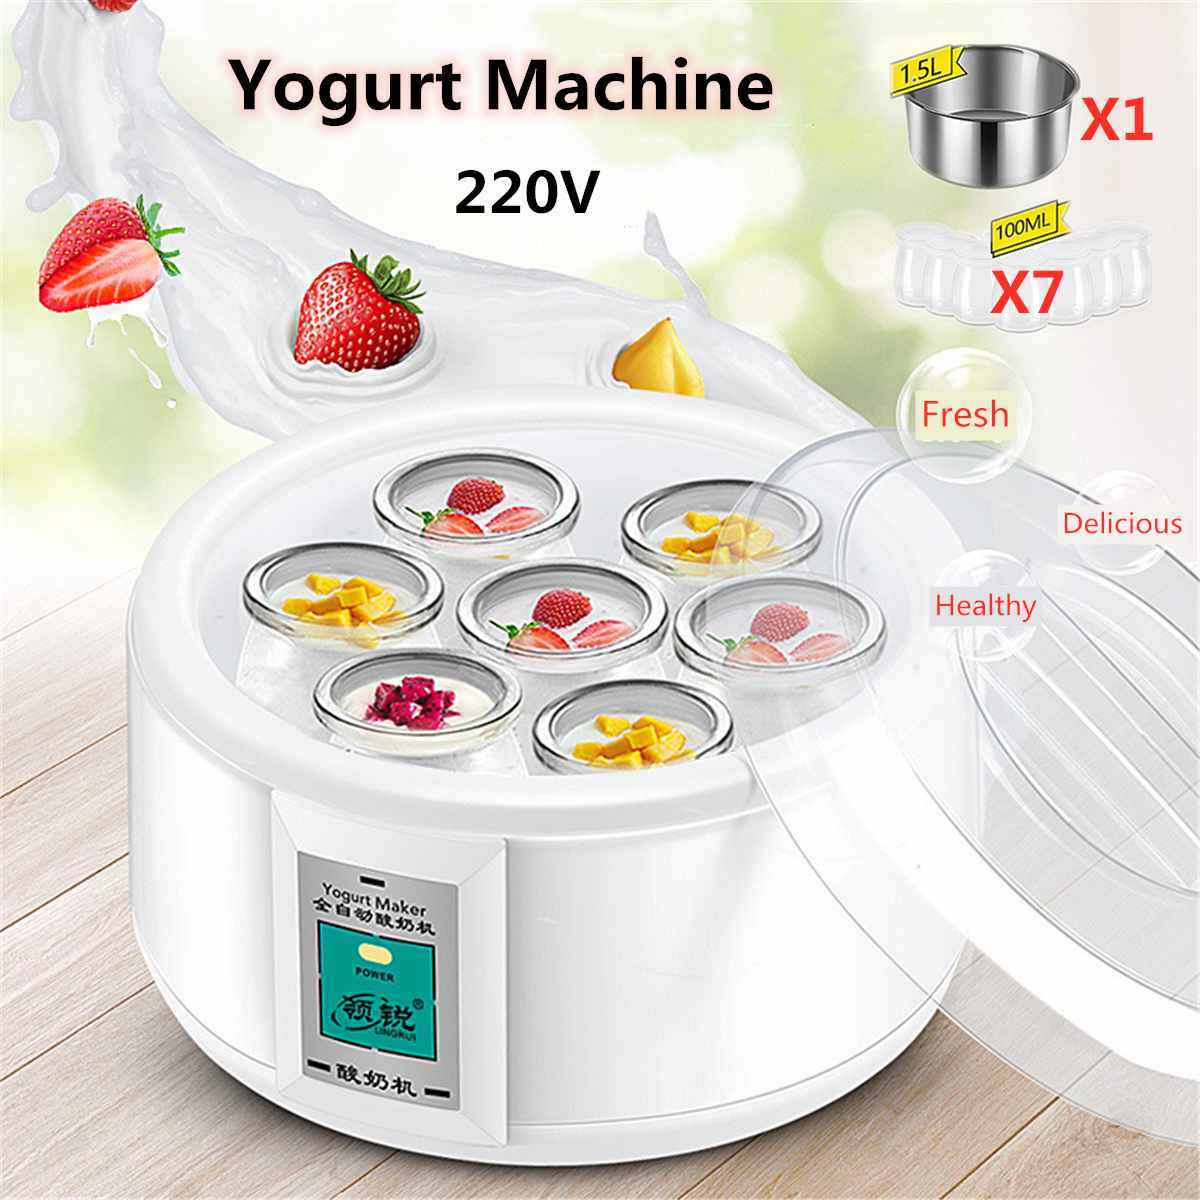 1.5L Automatic Yogurt Maker with 7 Jars DIY Tool Electric Yogurt Maker Yogurt 15W Kitchen Appliances Liner Stainless Steel